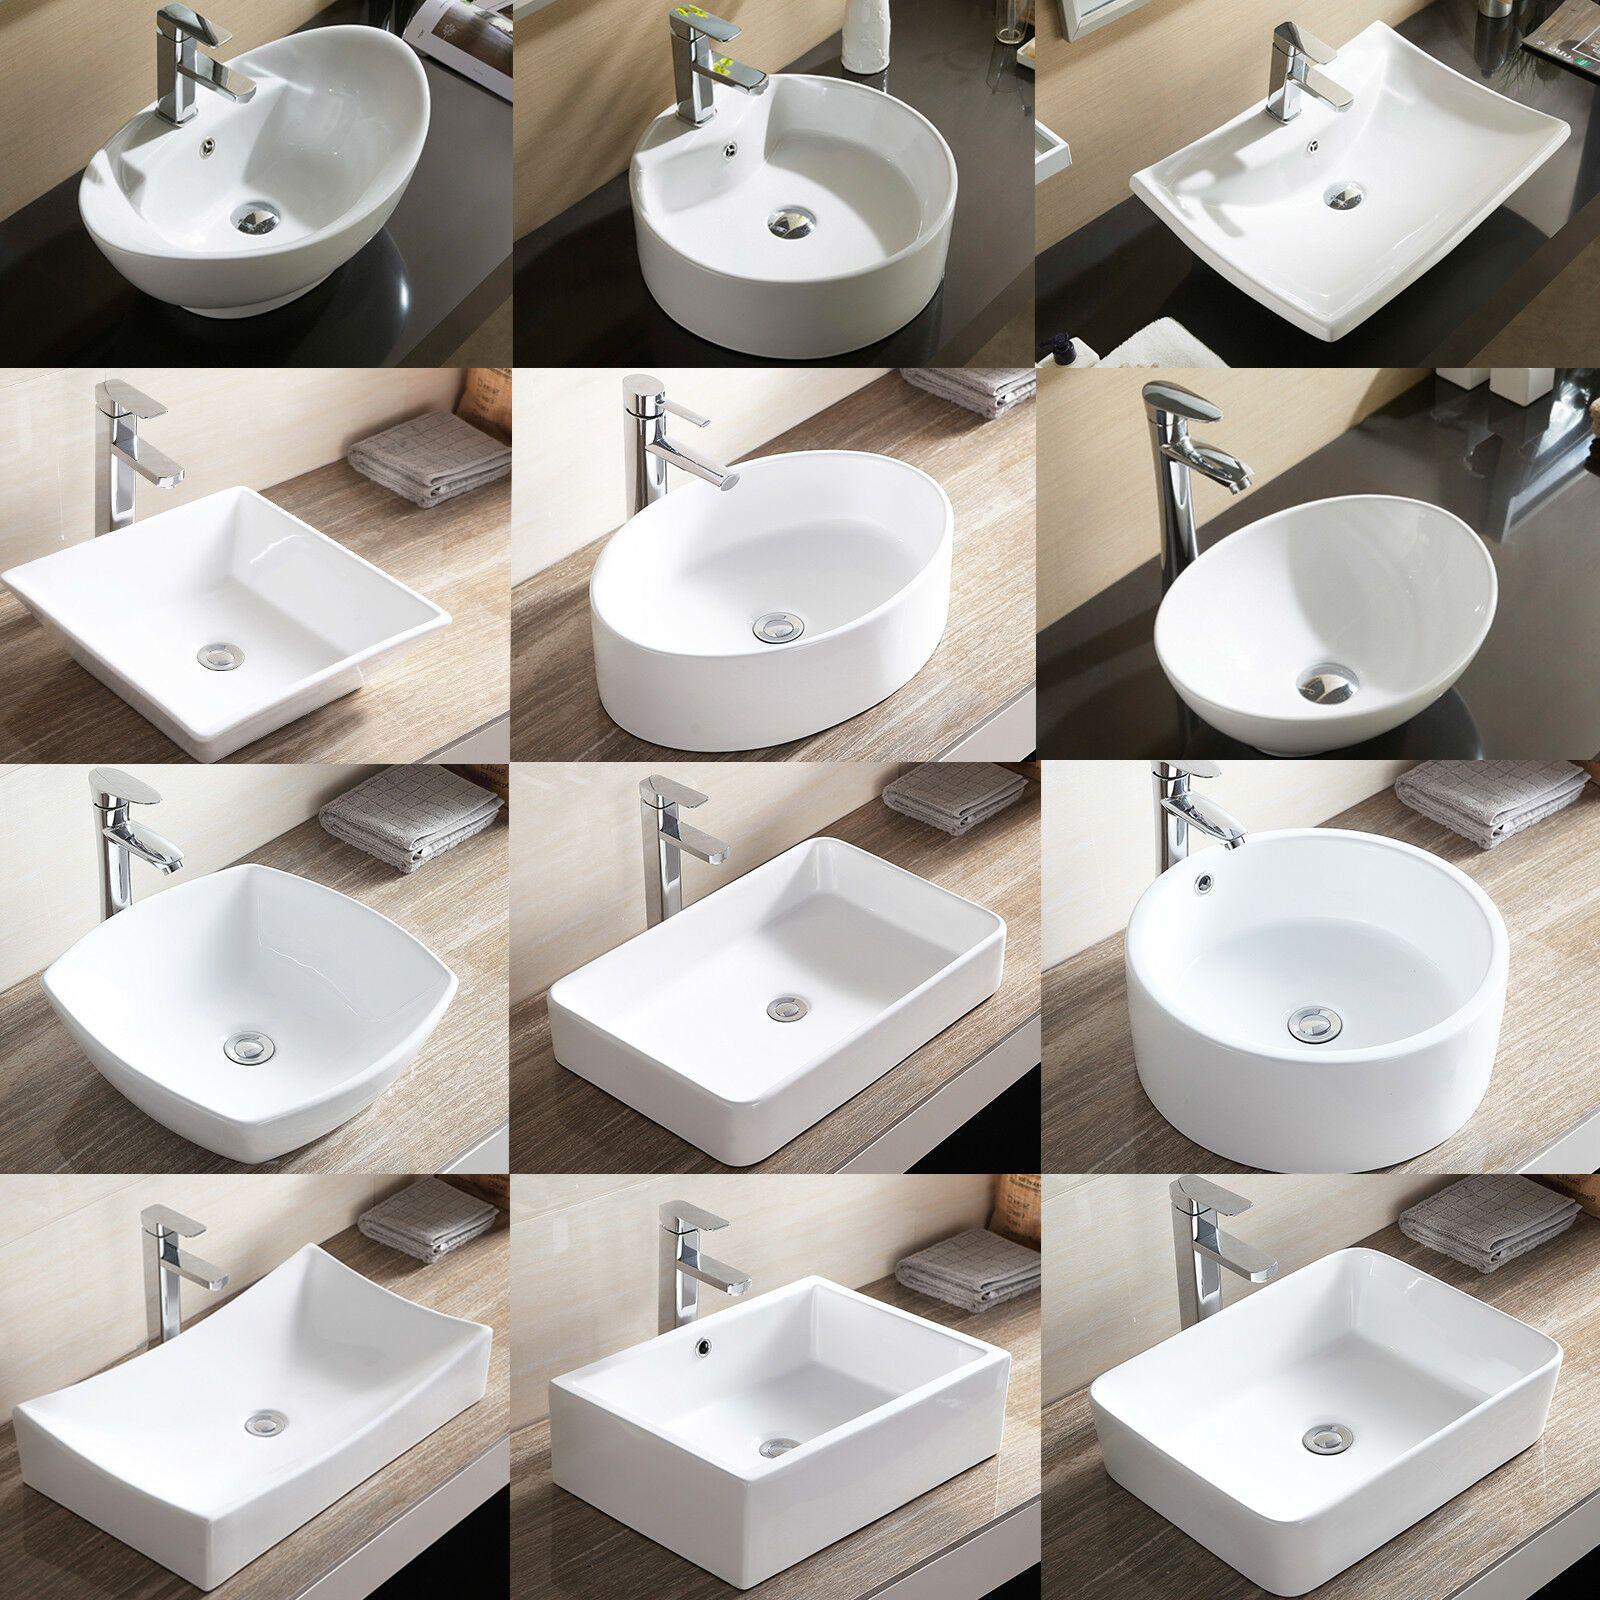 Porcelain Ceramic Vessel Bathroom Sink Basin With Pop Up Drain